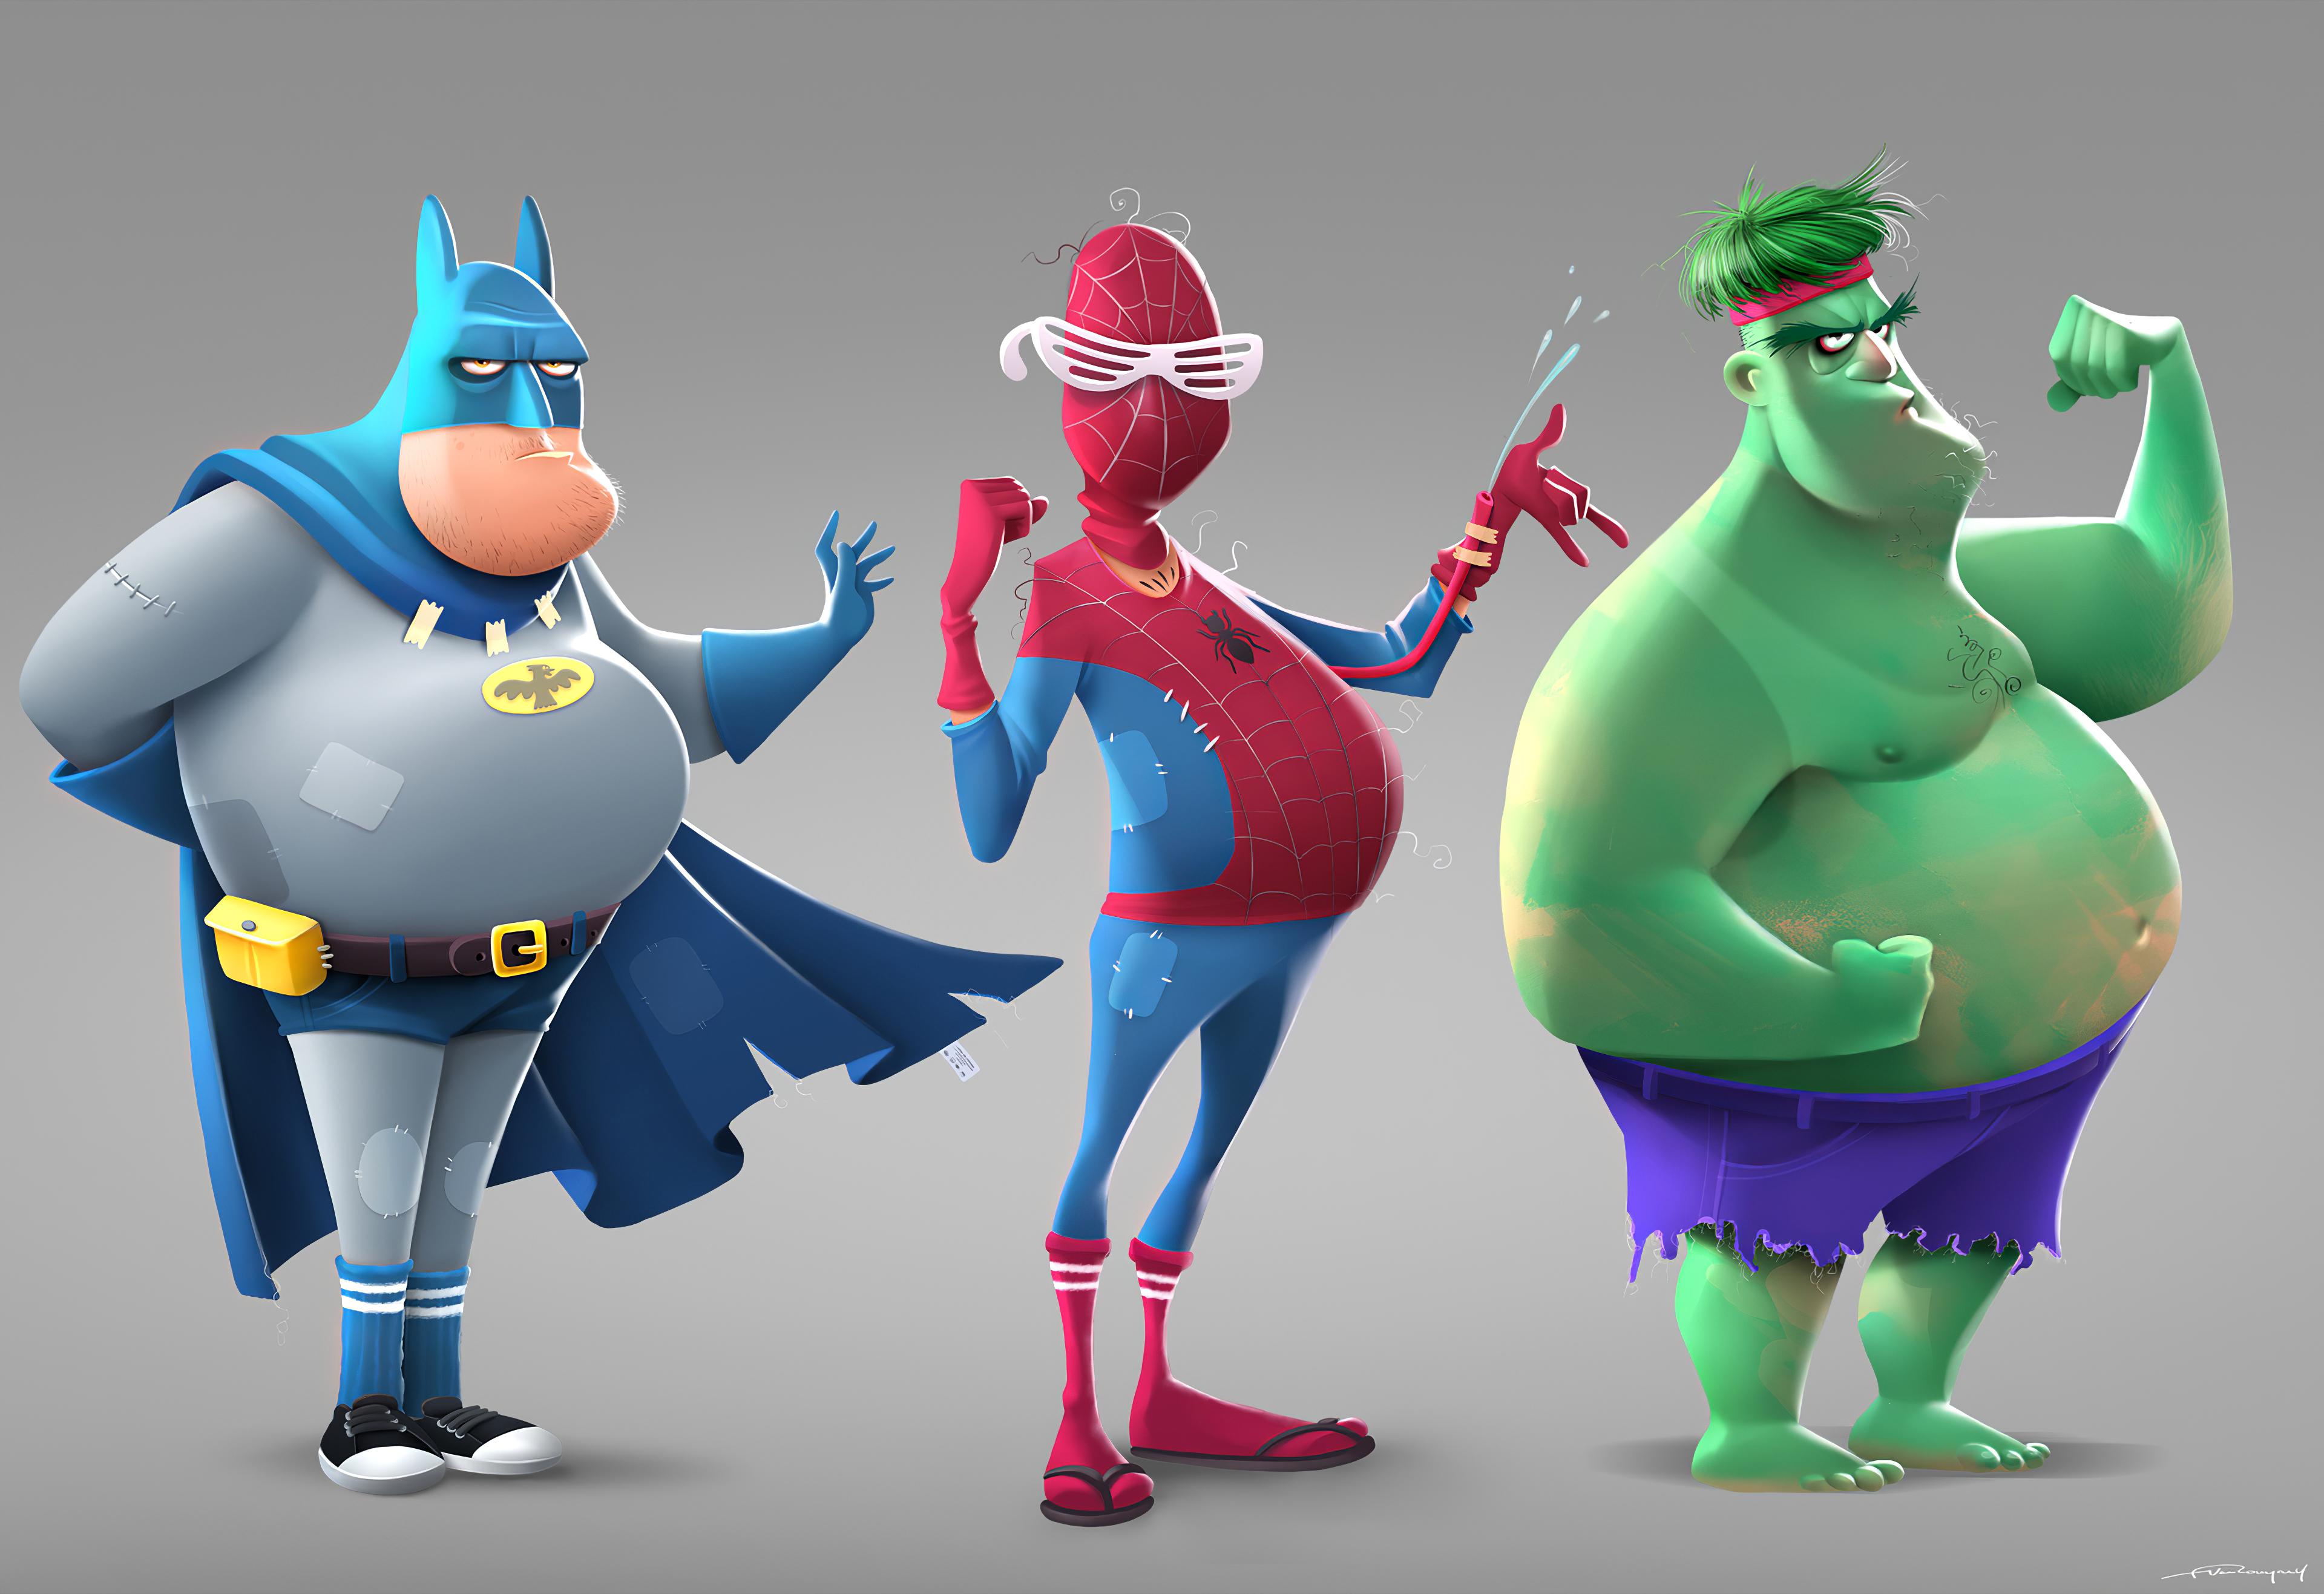 fat batman spiderman hulk 1576088876 - Fat Batman Spiderman Hulk - Fat Batman Spiderman Hulk hd 4k wallpapers